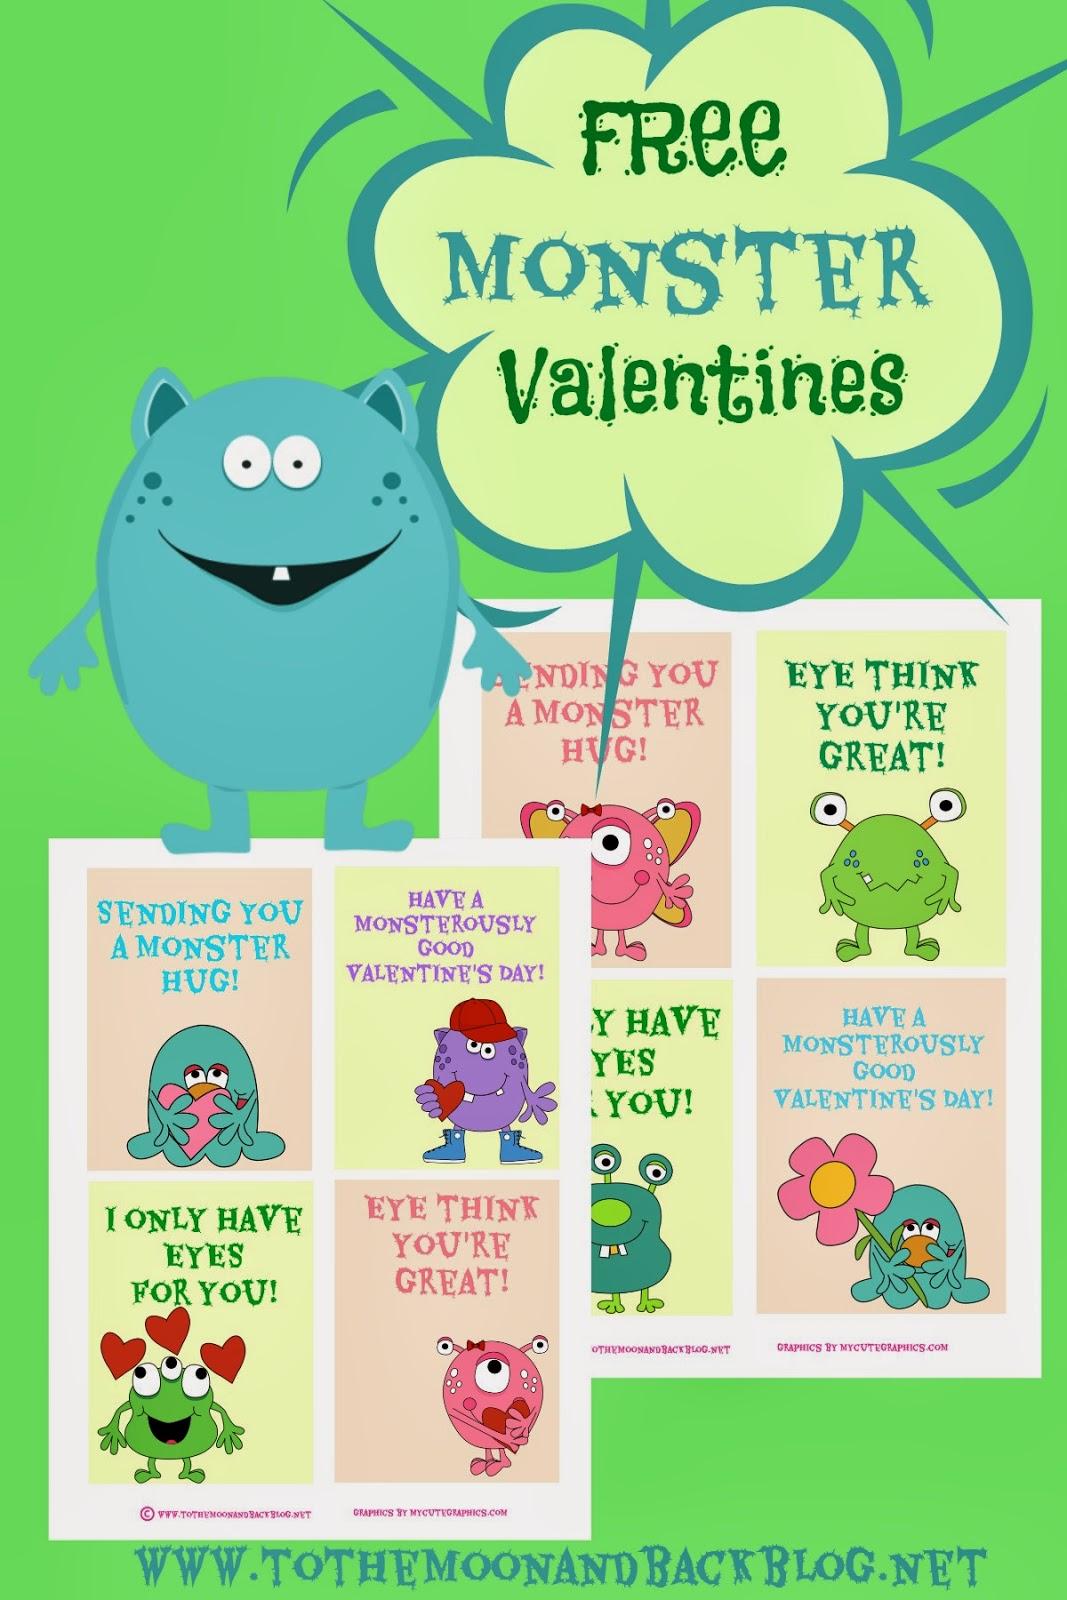 Free Monster Valentines